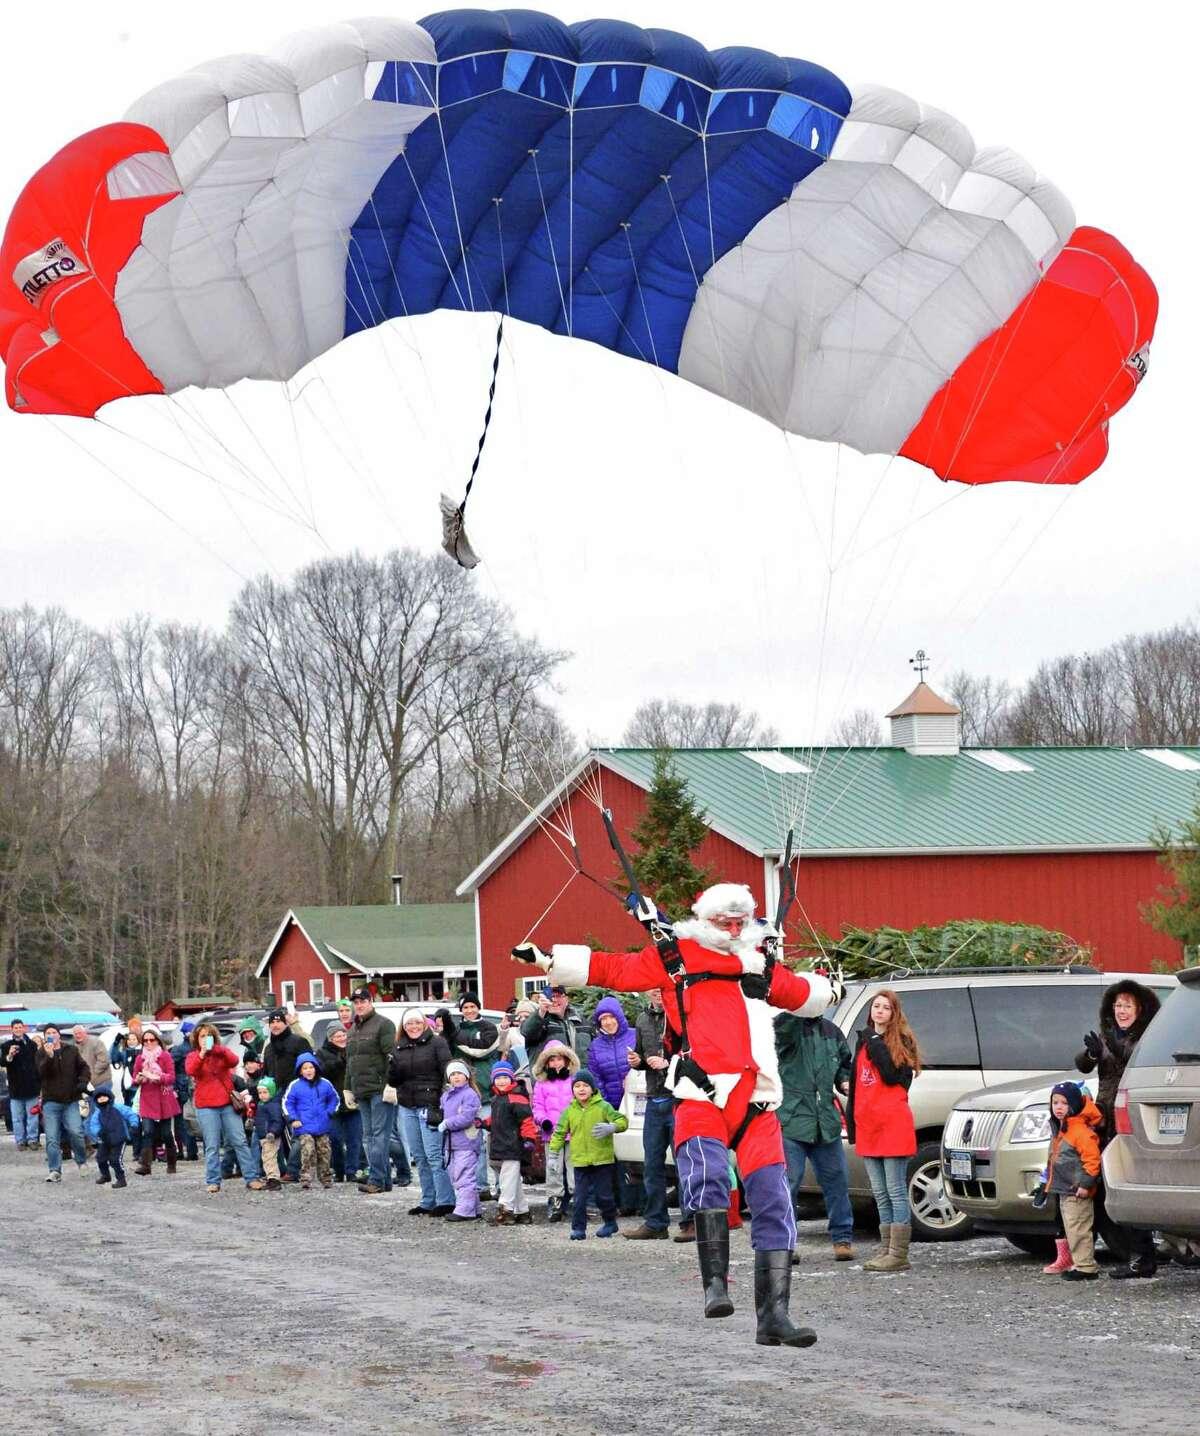 Santa parachutes in to the Ellms Christmas Tree Farm Saturday Nov. 30, 2013, in Ballston Spa, NY. (John Carl D'Annibale / Times Union)